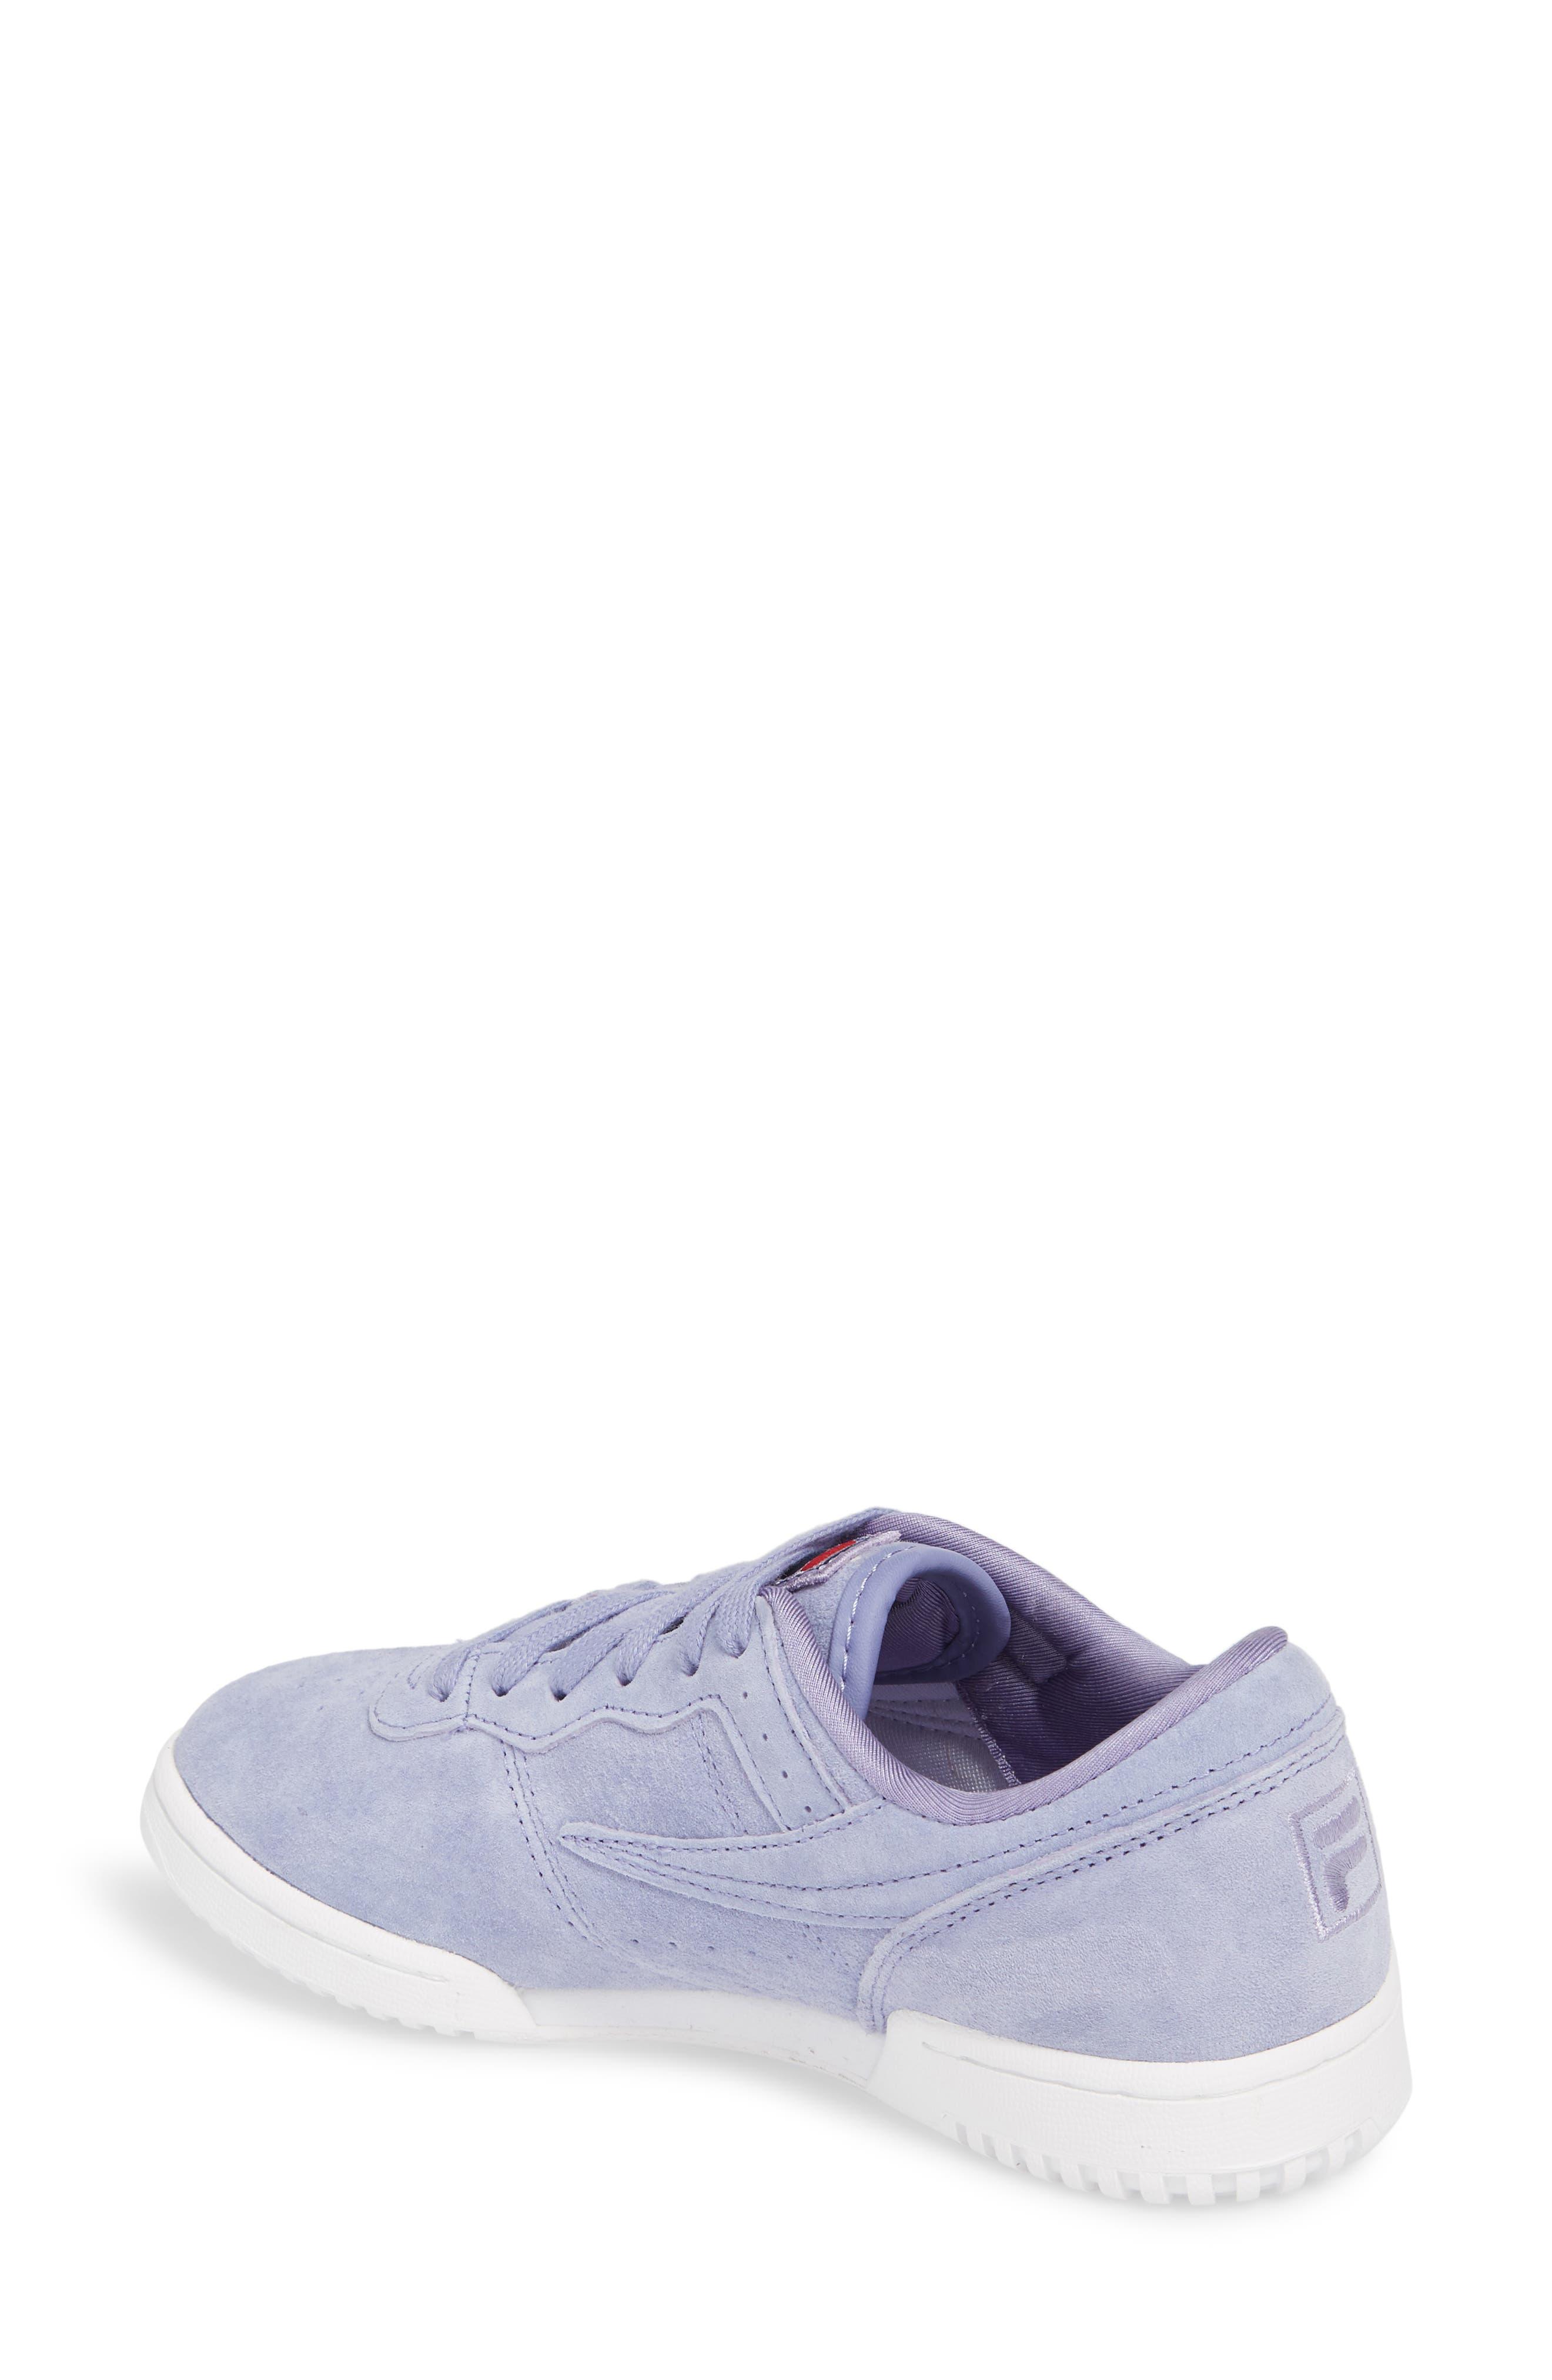 Alternate Image 2  - FILA Original Fitness Premium Sneaker (Women)